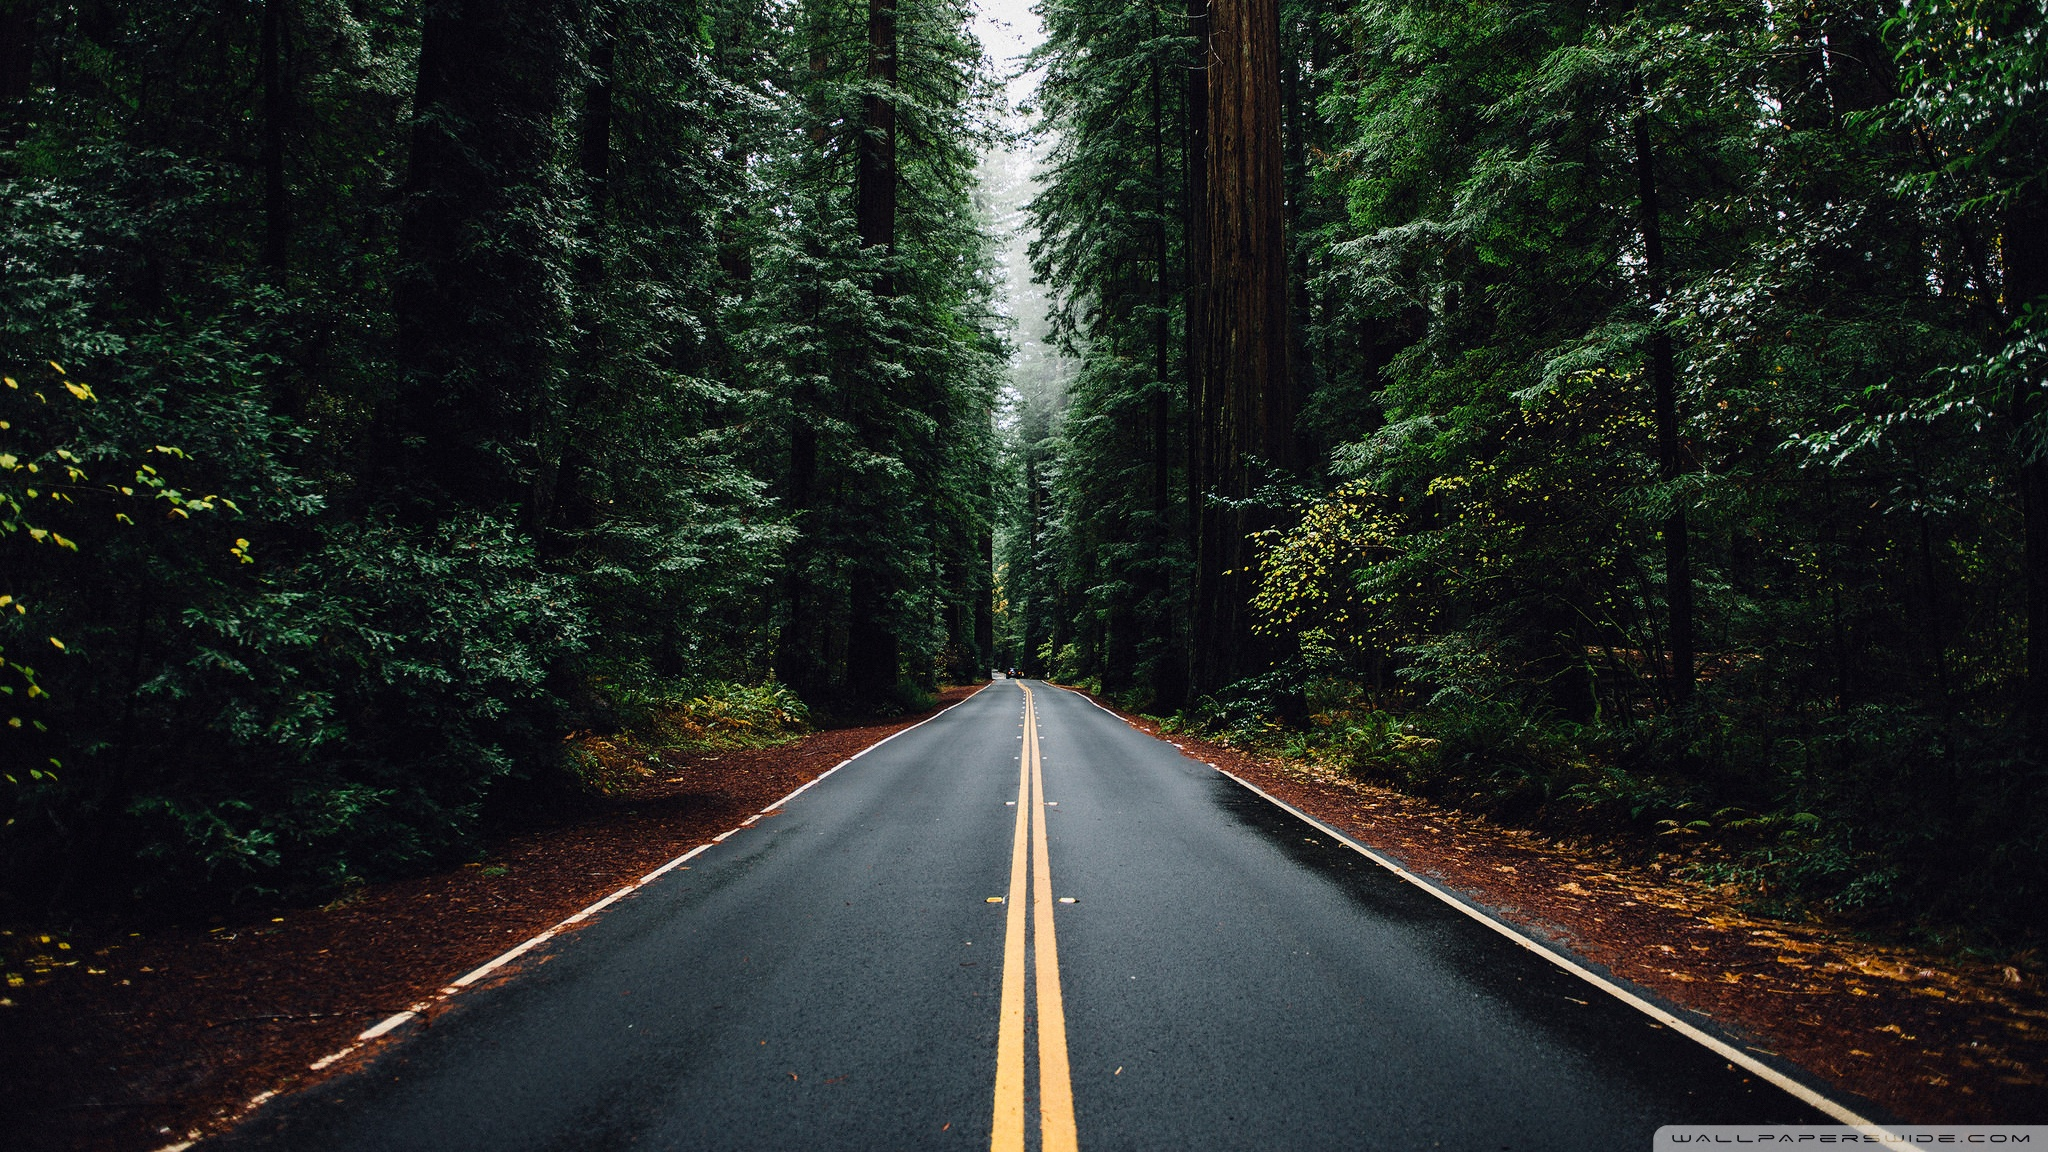 beautiful_road_3-wallpaper-2048x1152.jpg